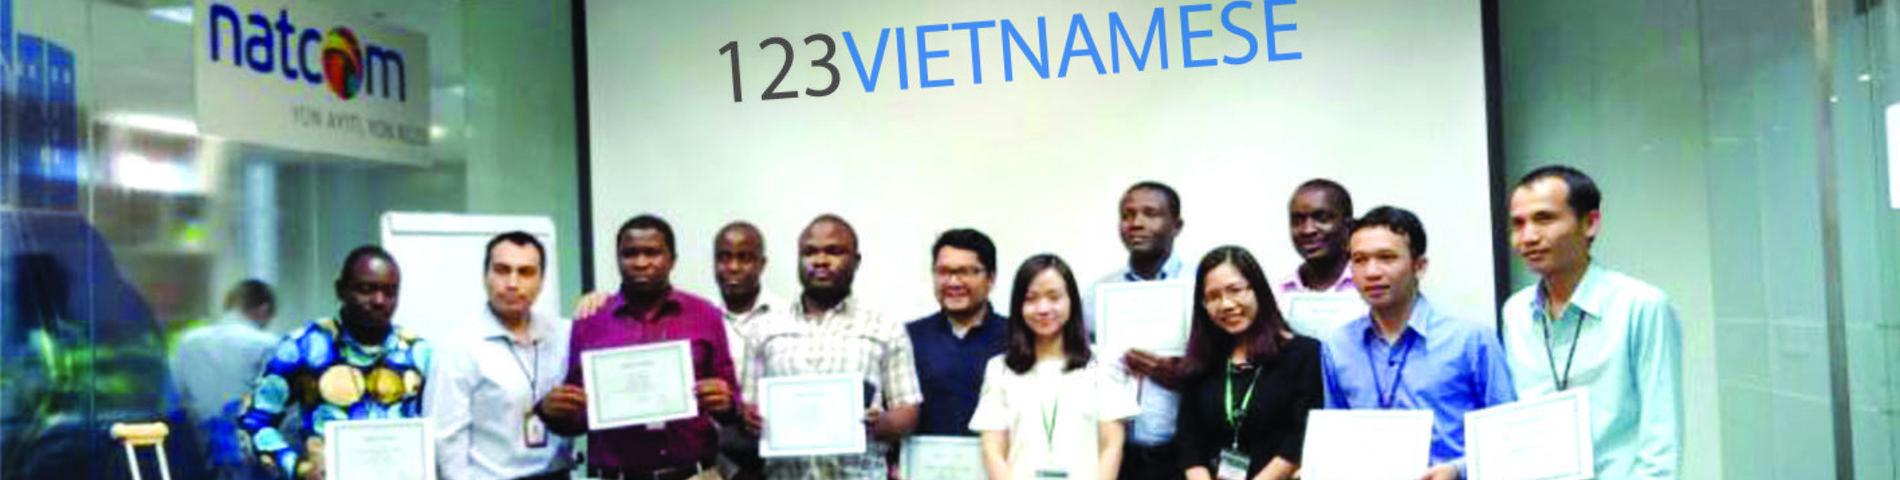 123 Vietnamese Center picture 1